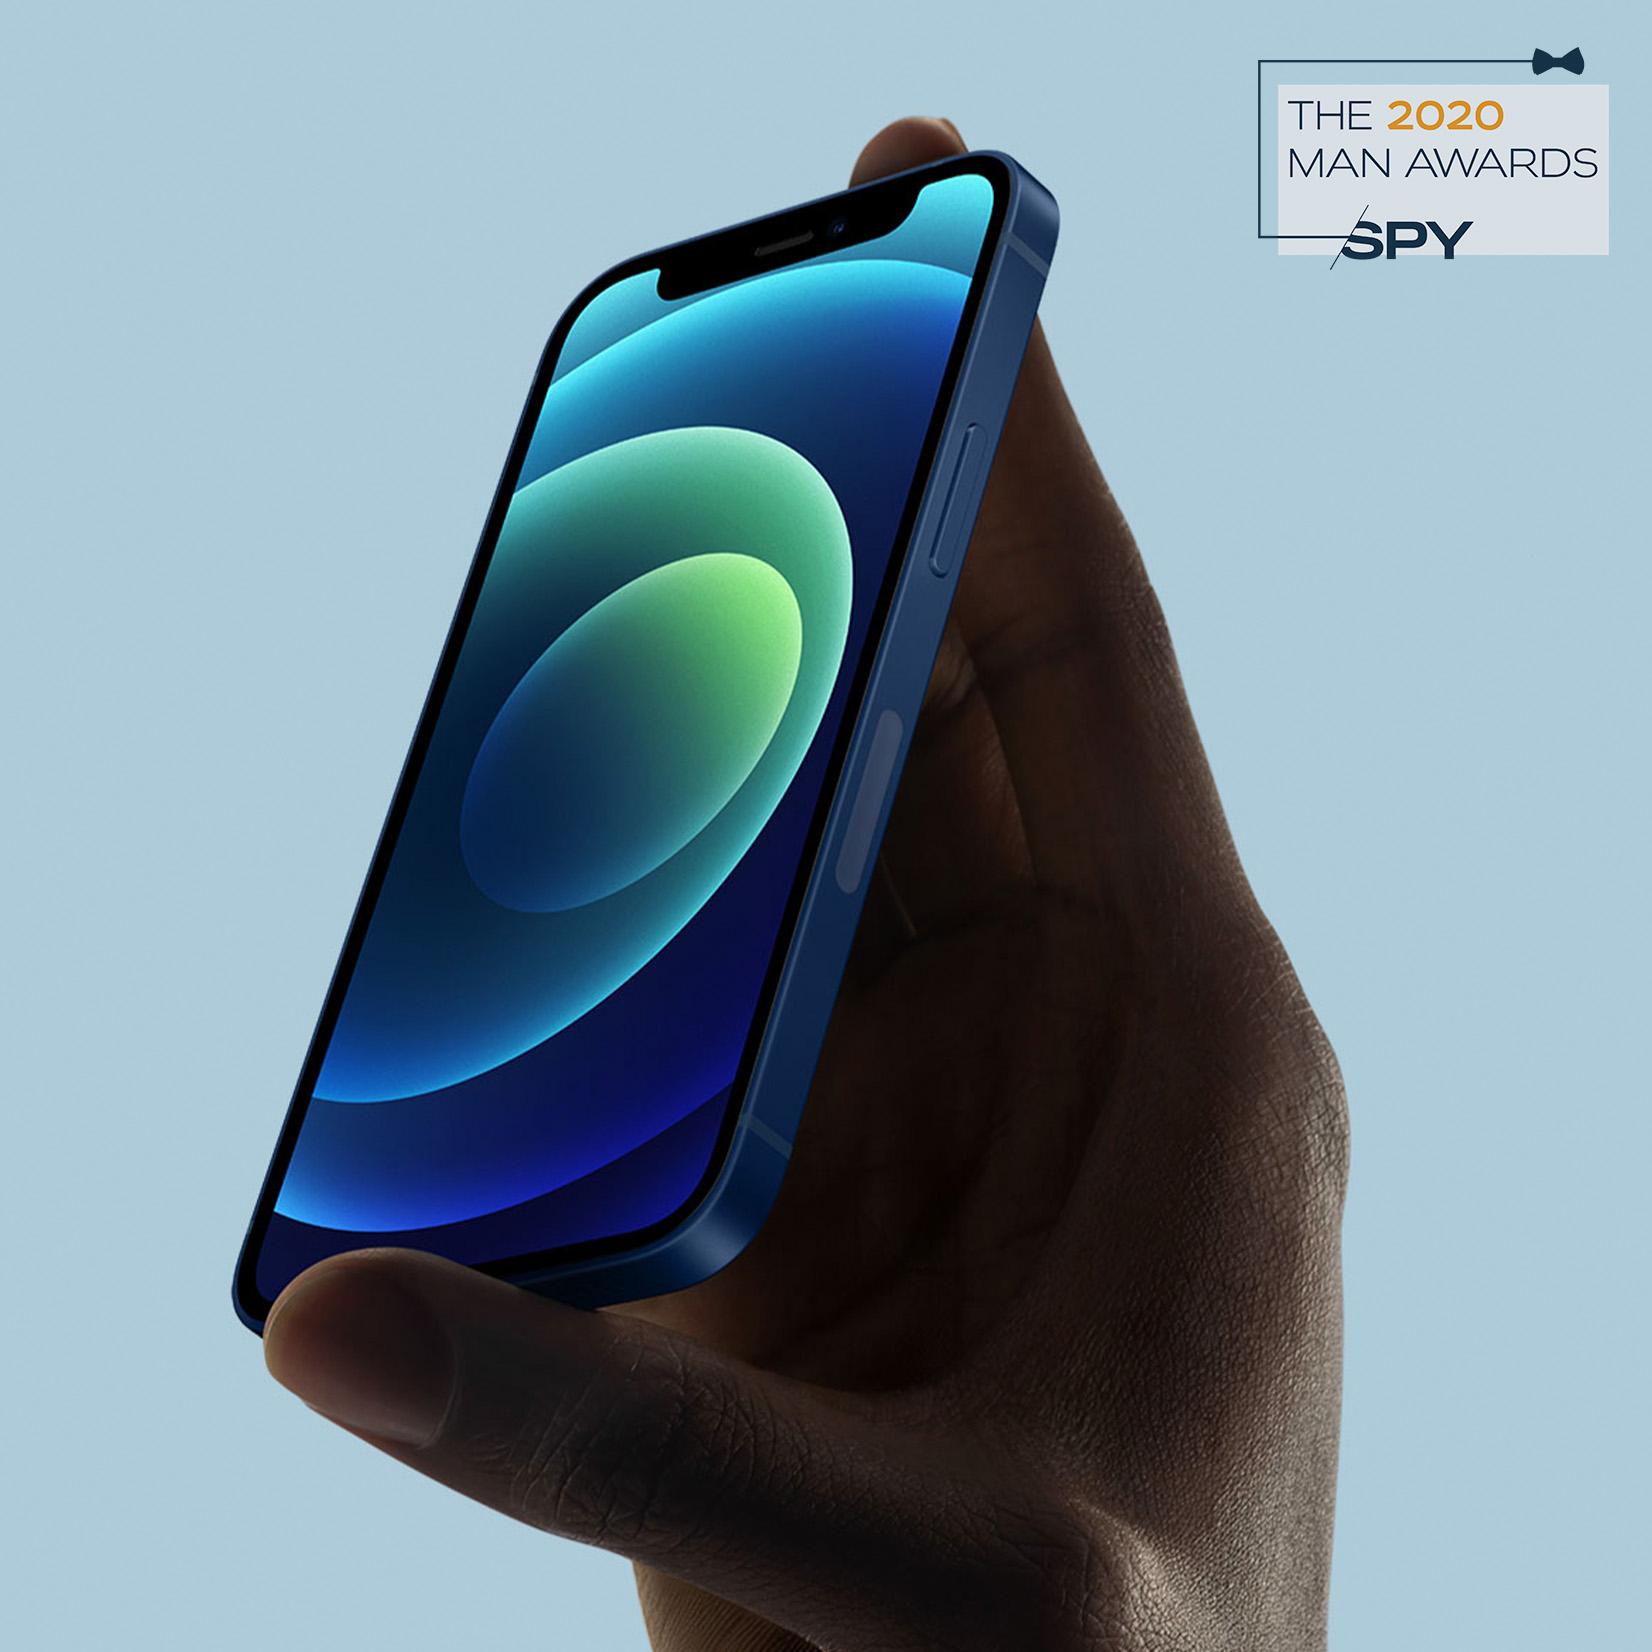 iPhone 12 Mini, best smartphone of 2020